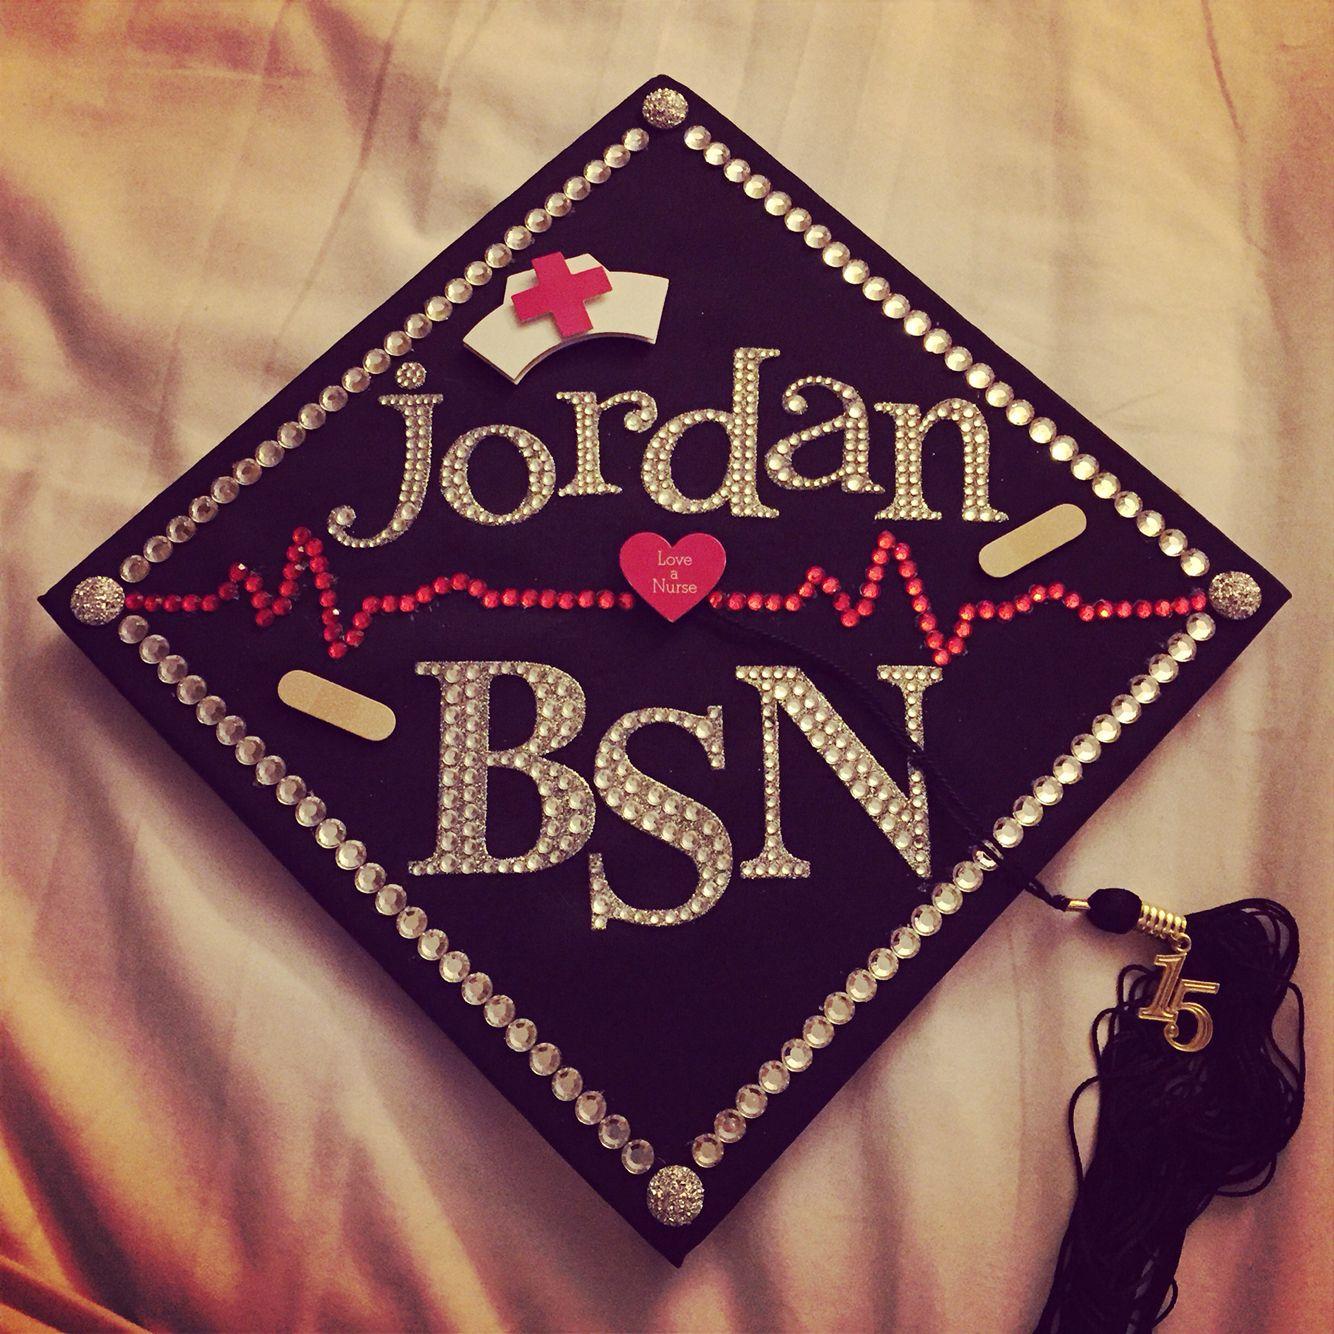 My Graduation Cap For Nursing School! Get To Wear This Bad